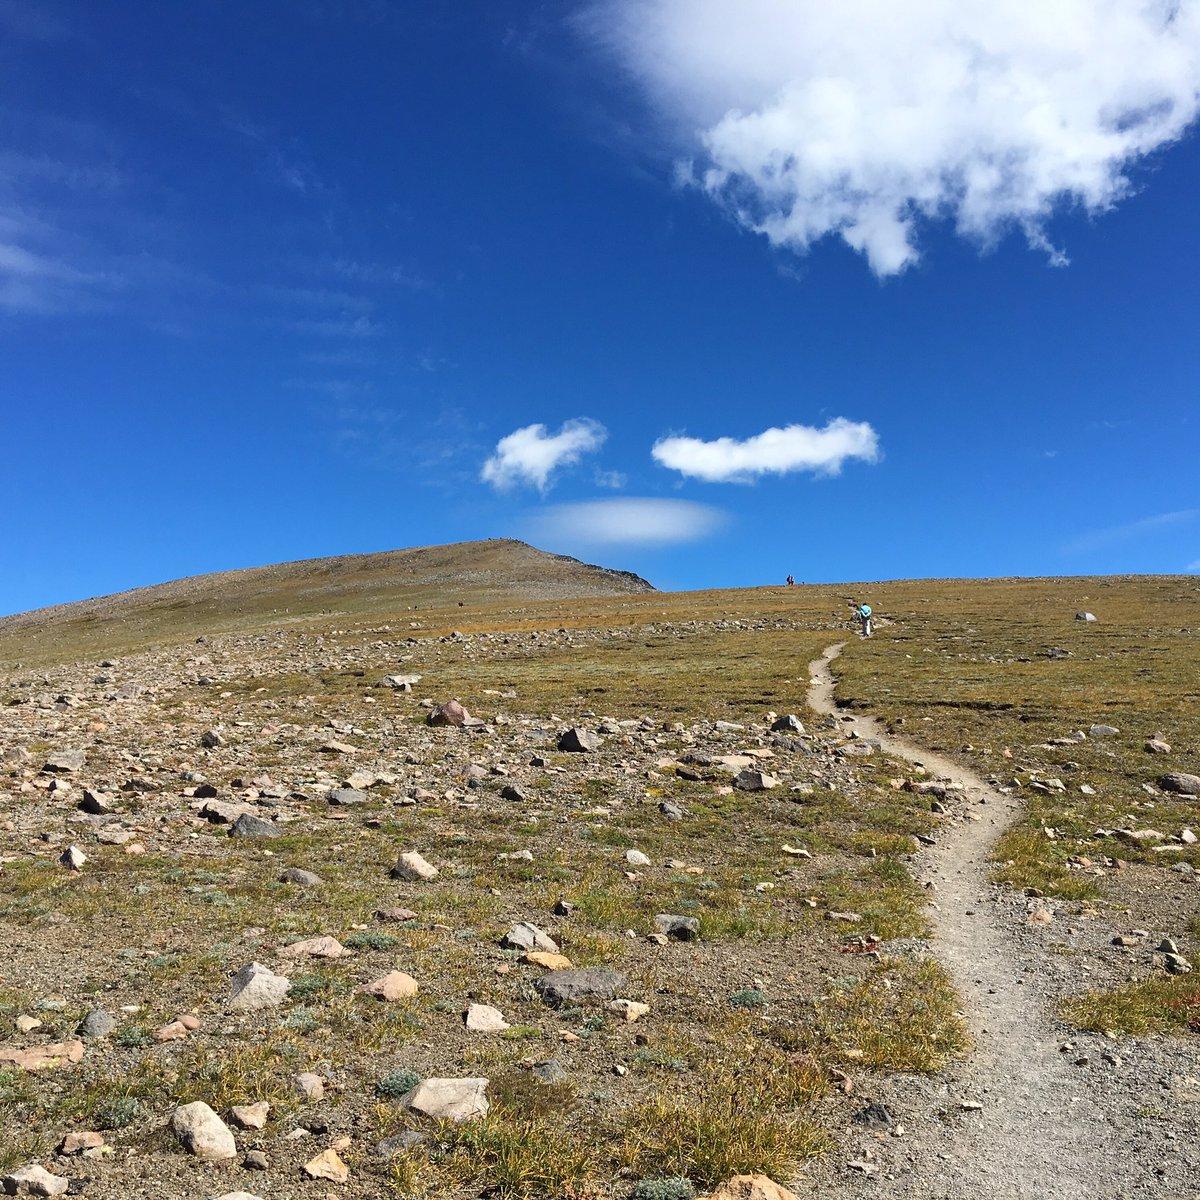 Trail to the sky. Third Burroughs at @MountRainierNPS #pnw #hiking https://t.co/m0ruz4xRnR